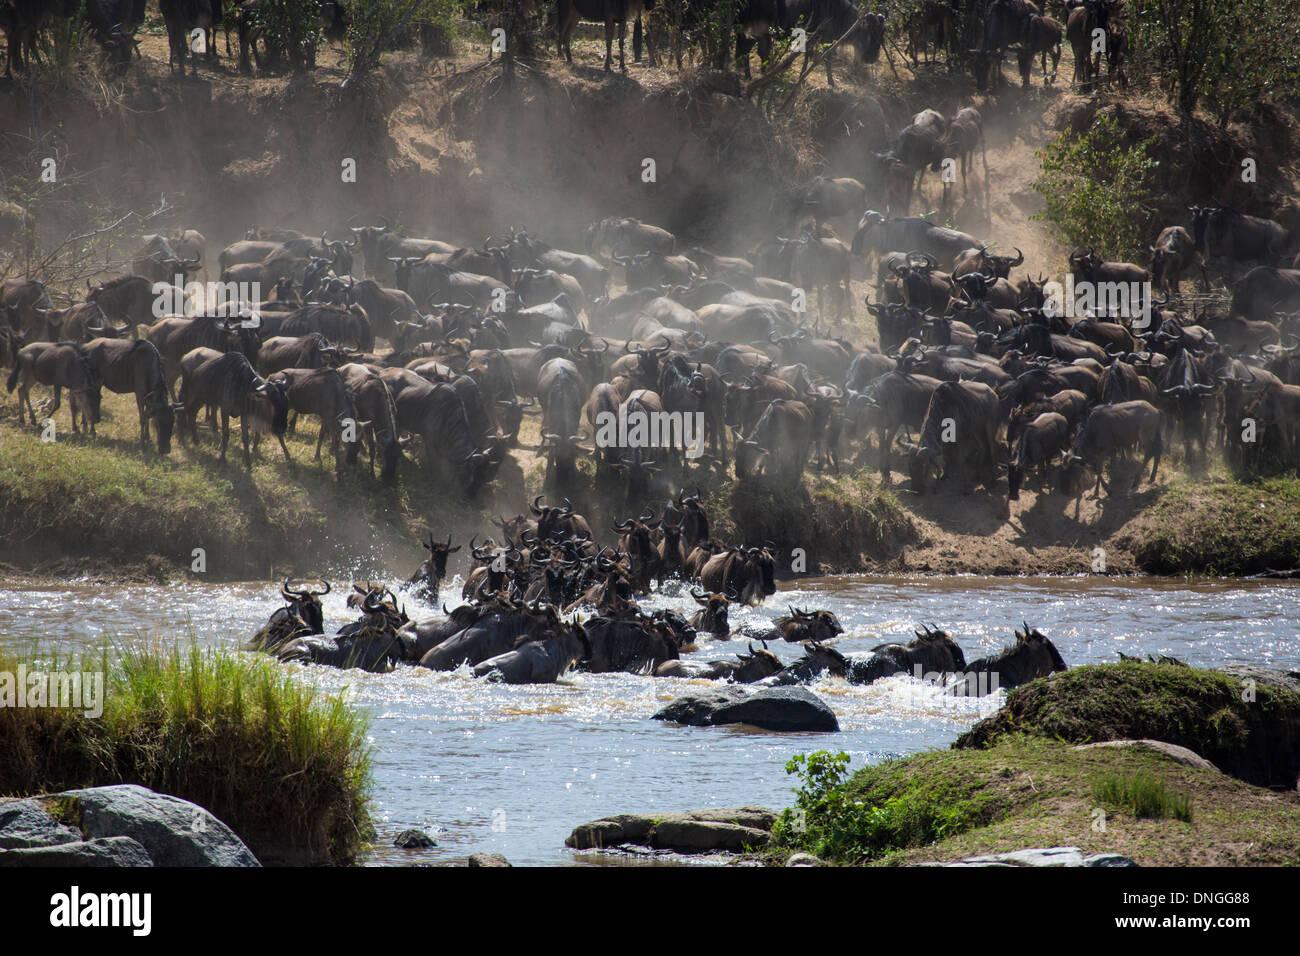 The great migration in North Serengeti, Tanzania - Stock Image